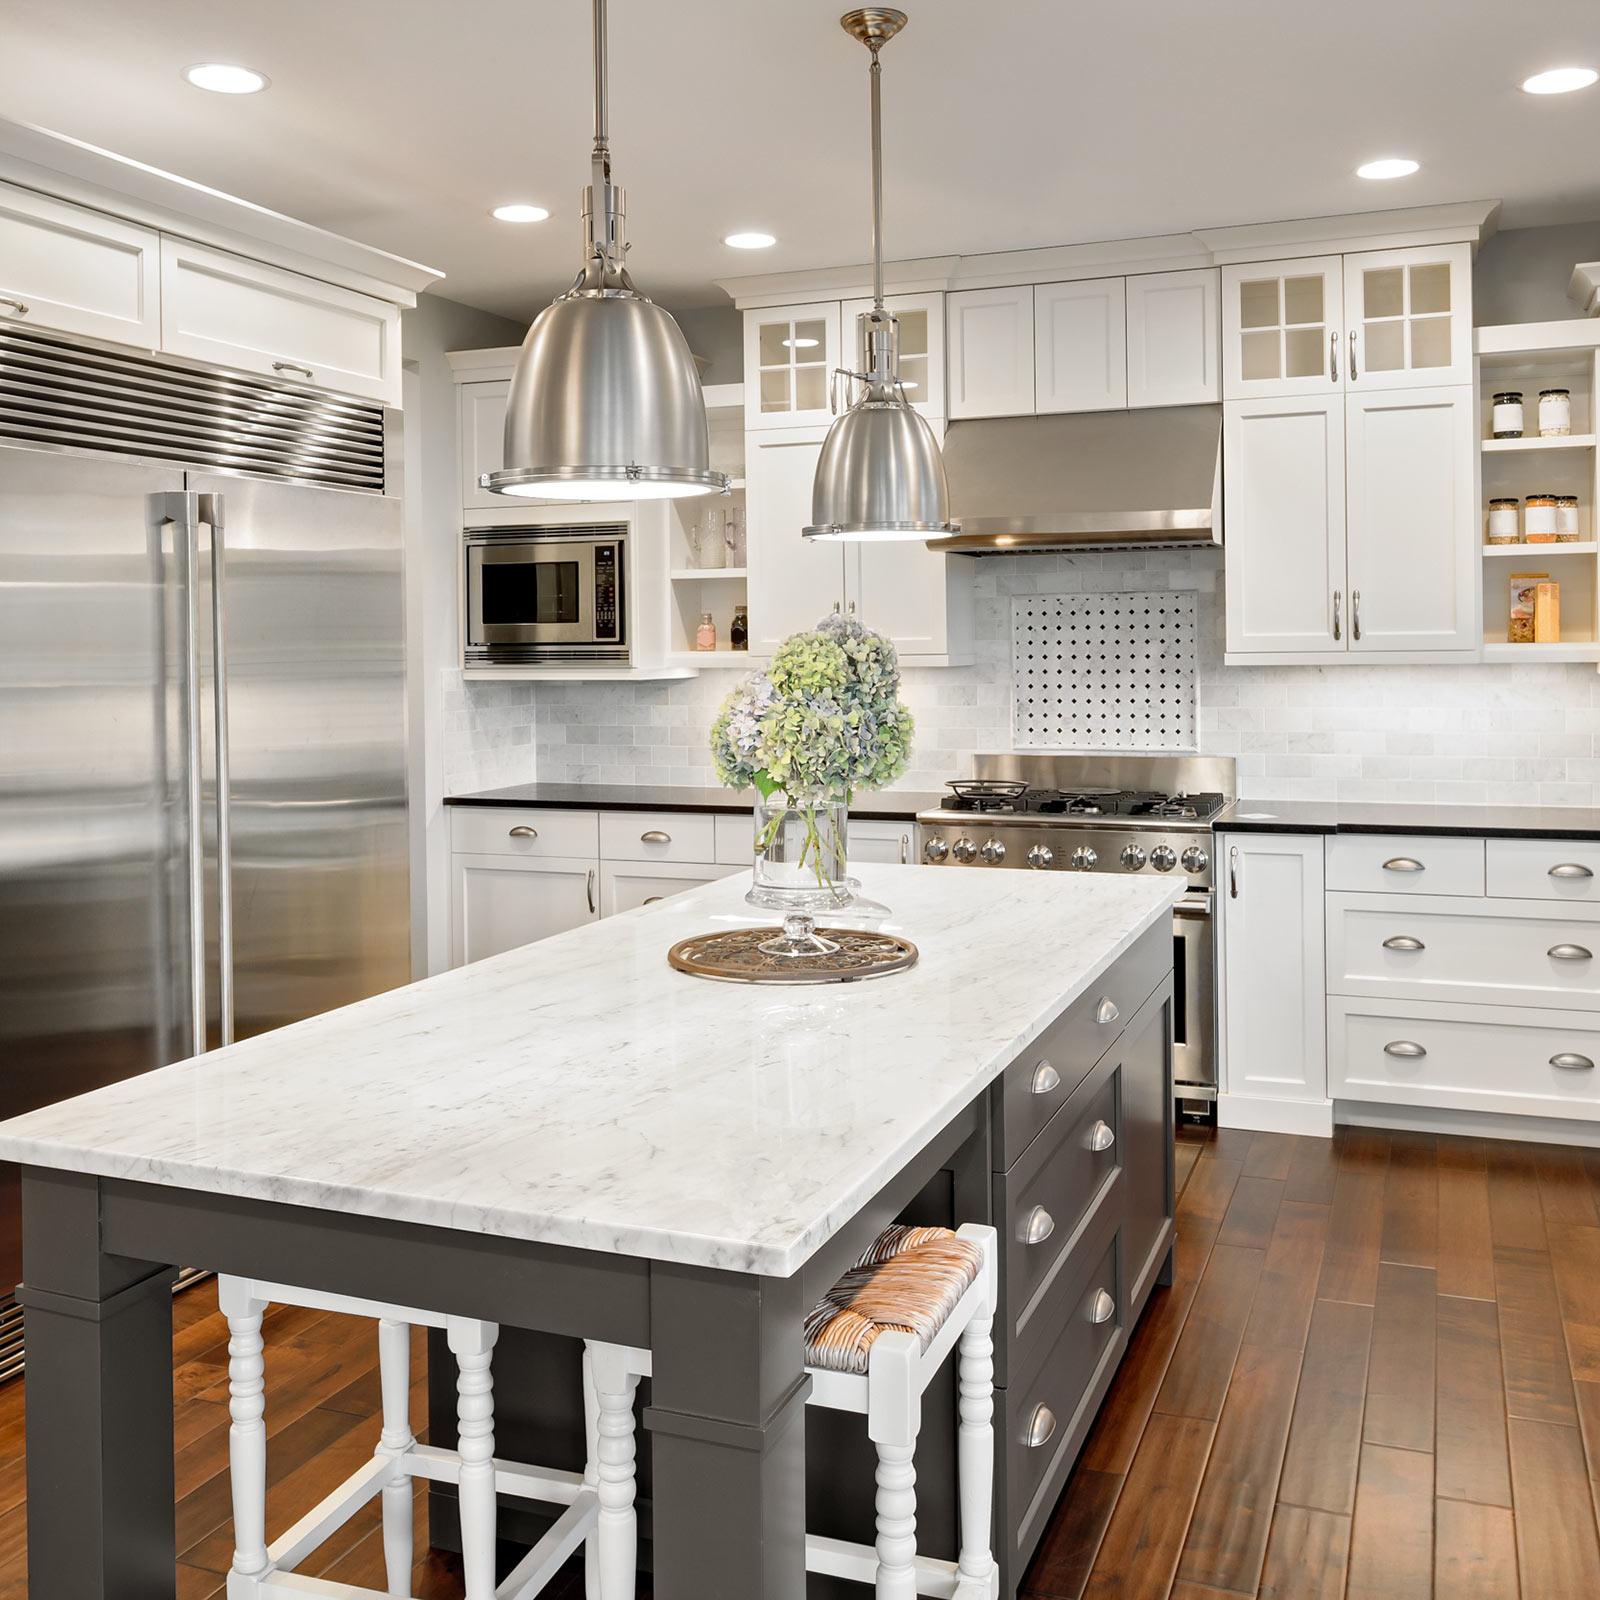 Choosing the right backsplashes for kitchen | Shan's Carpets & Fine Flooring